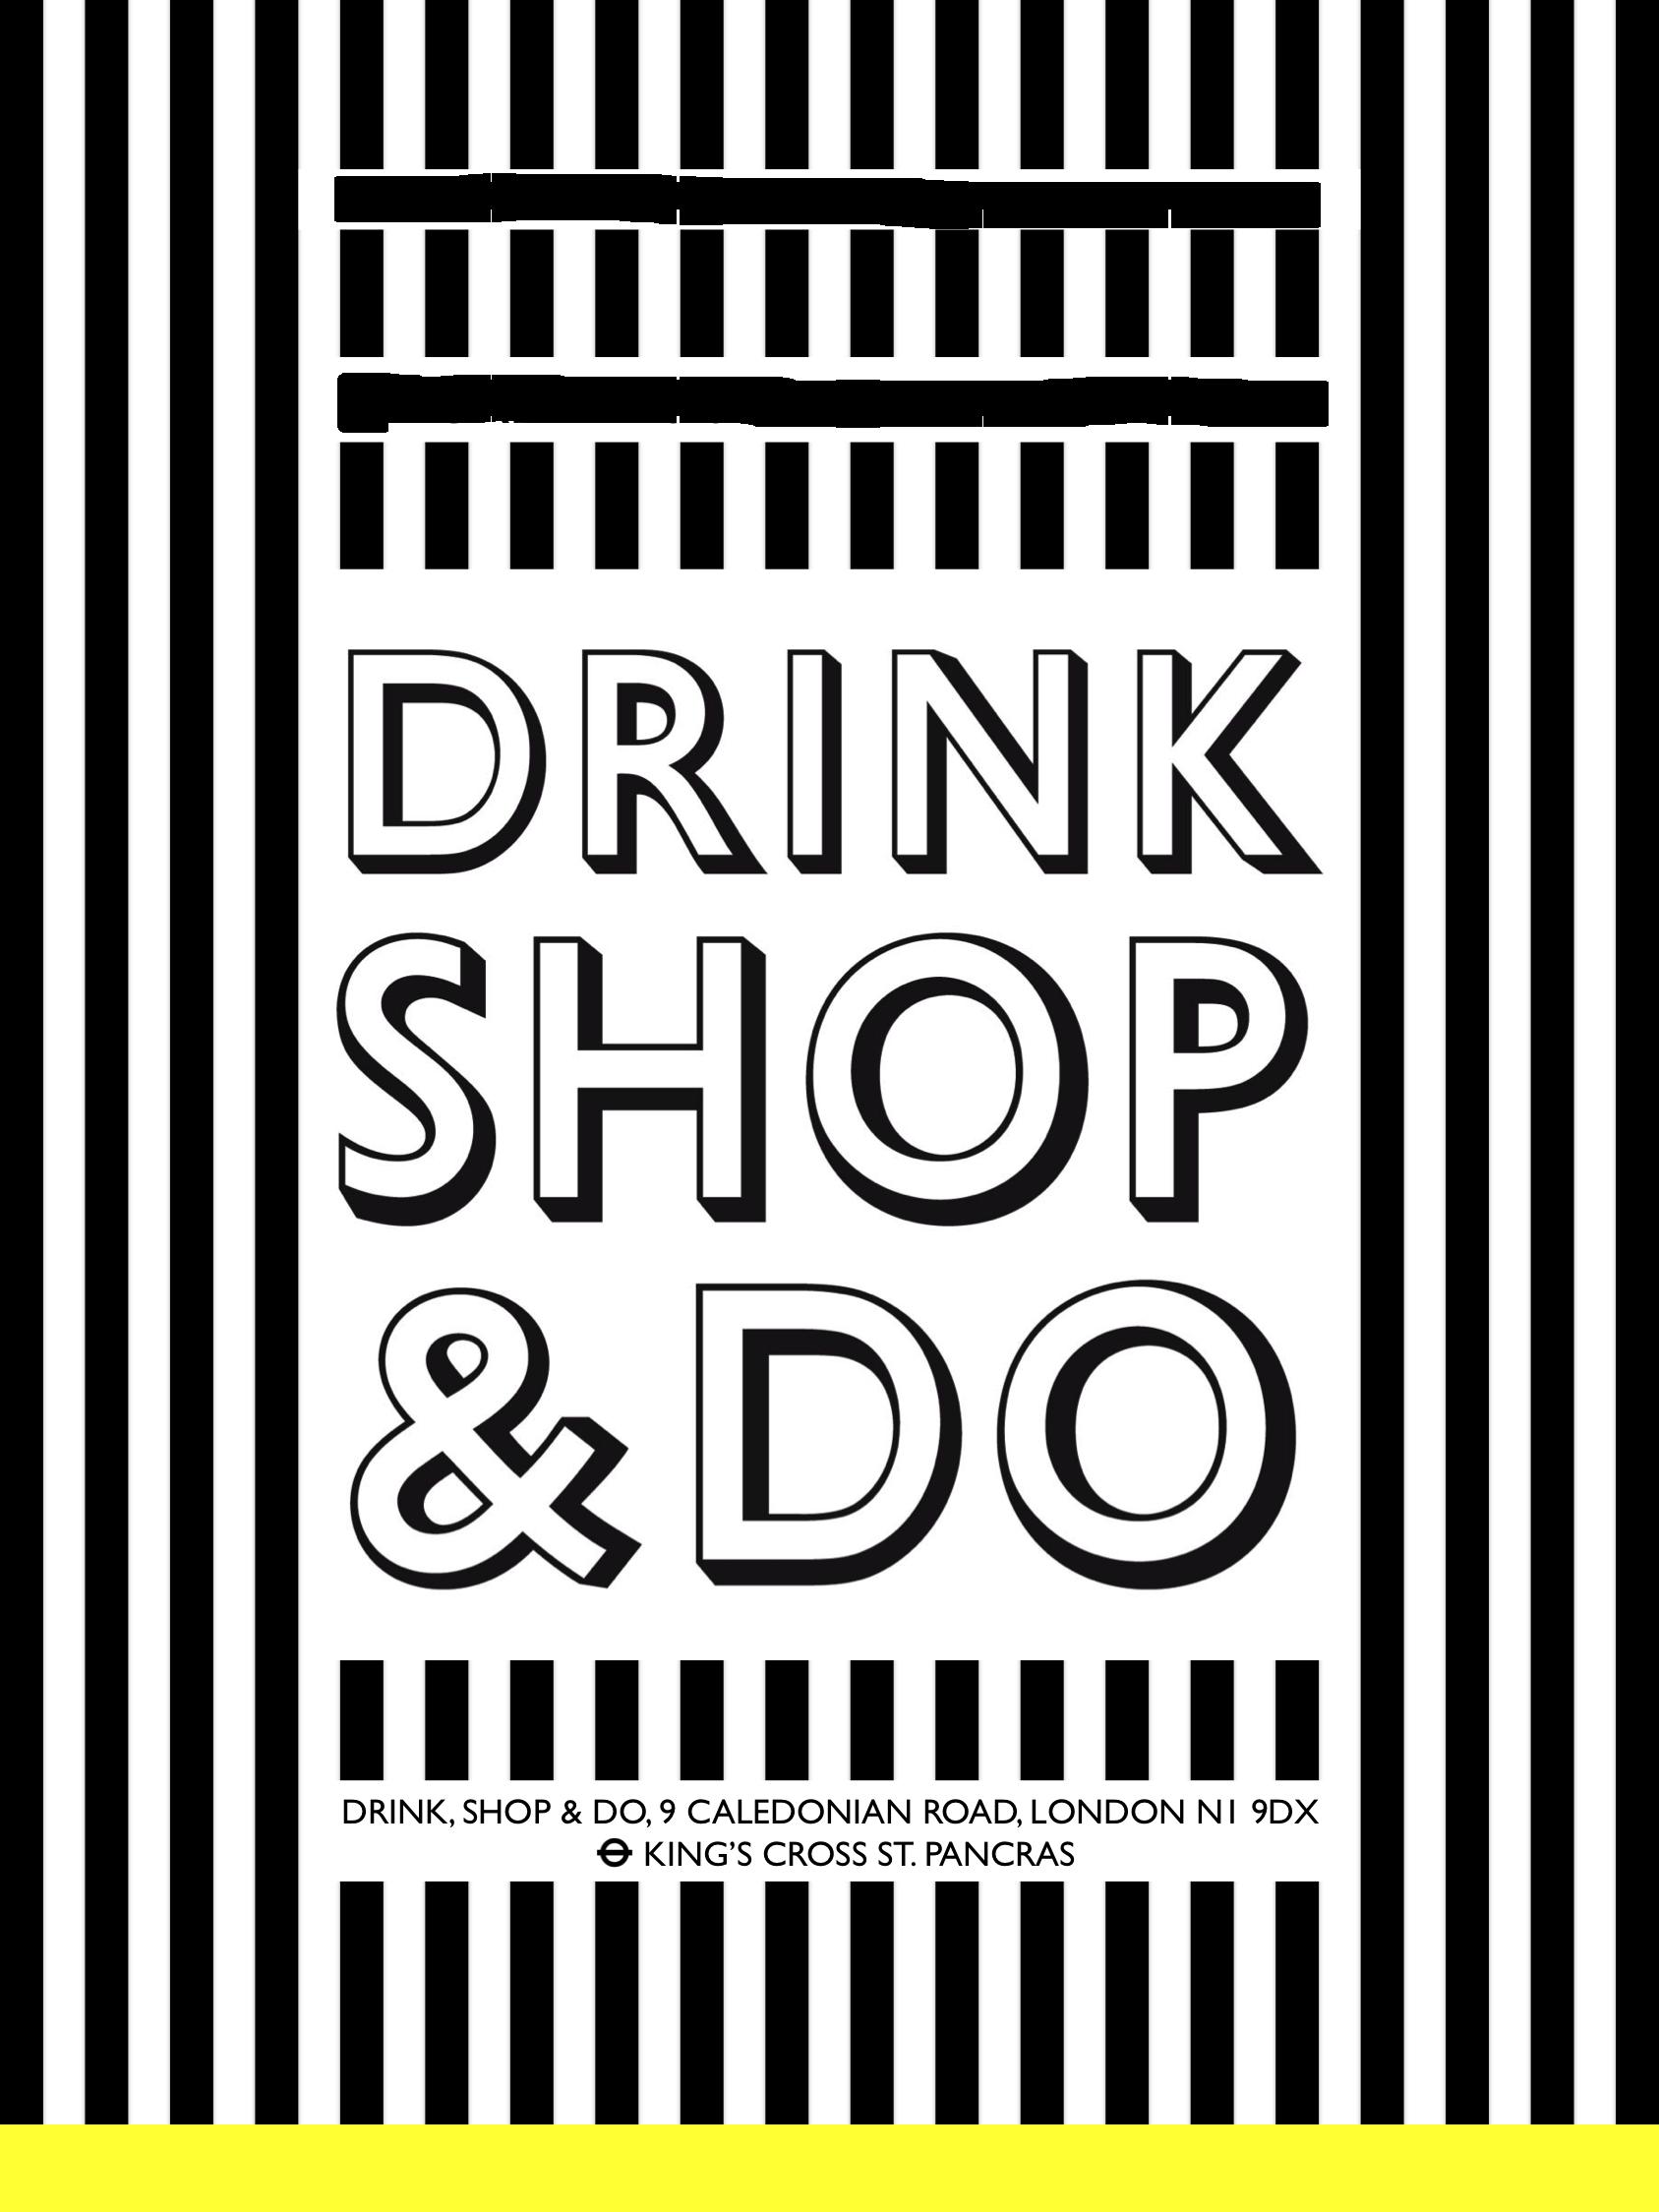 Wednesday-DrinkShopDo